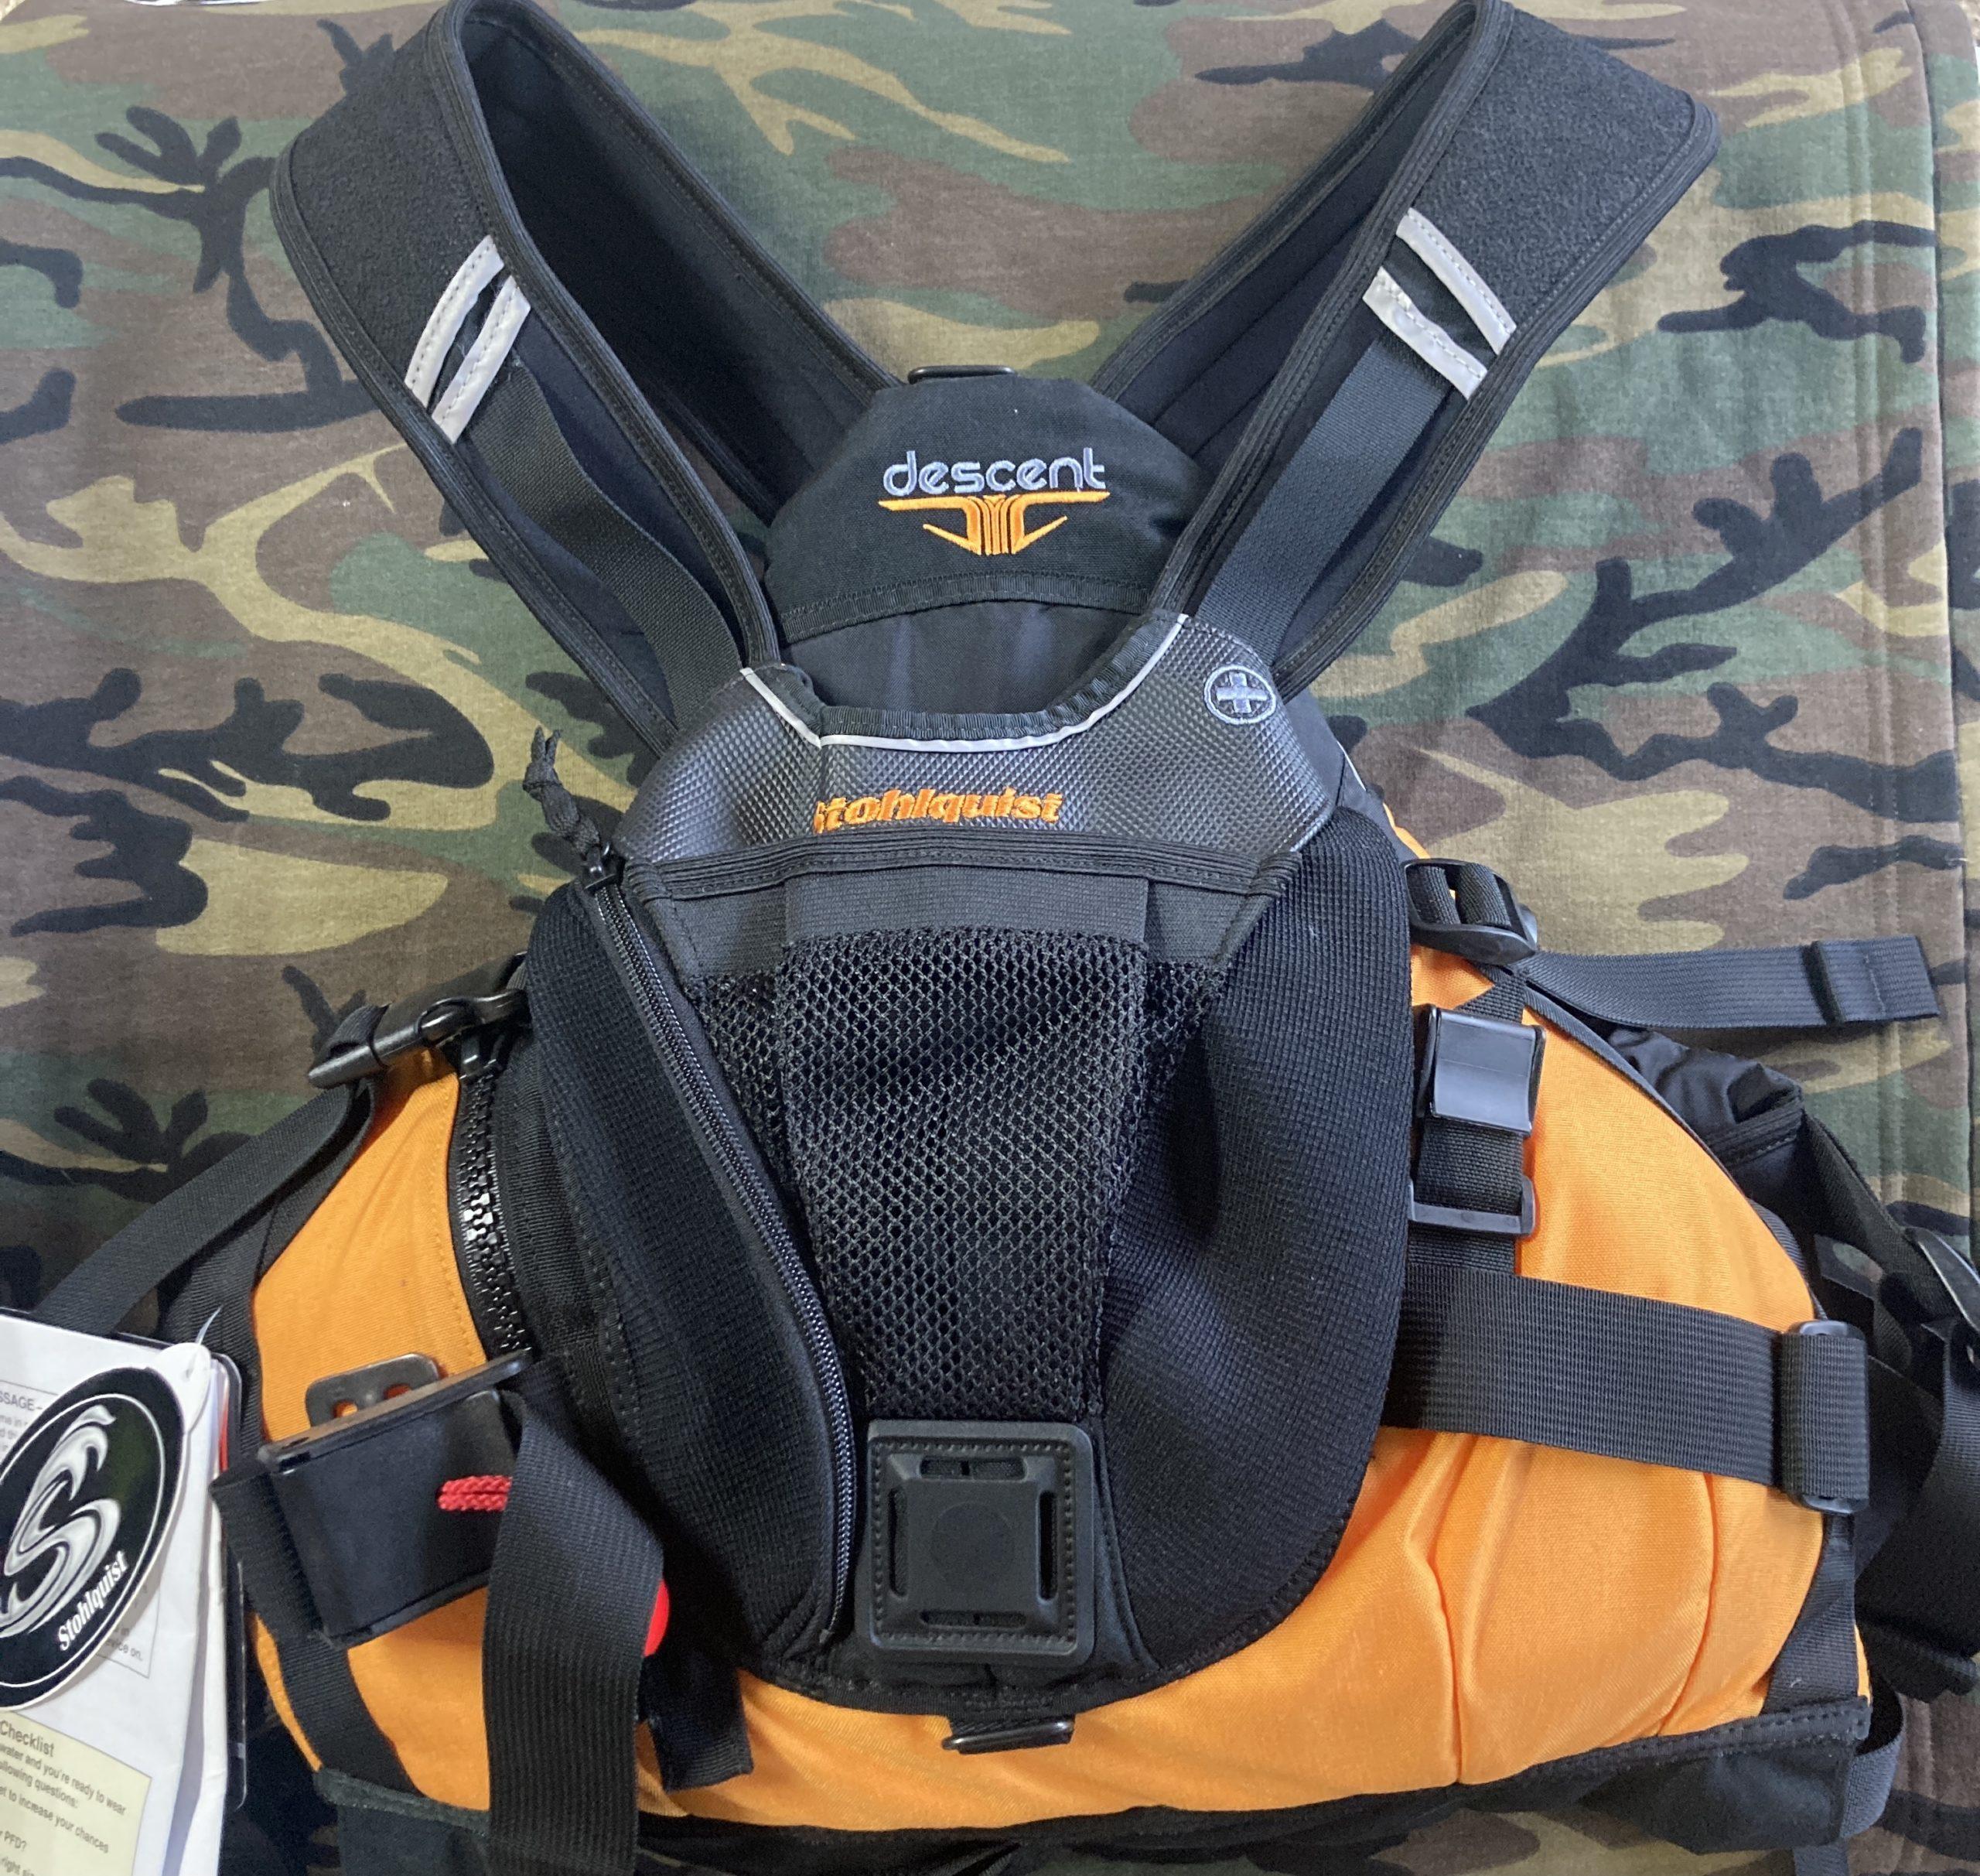 Stohlquist Descent Rescue Vest